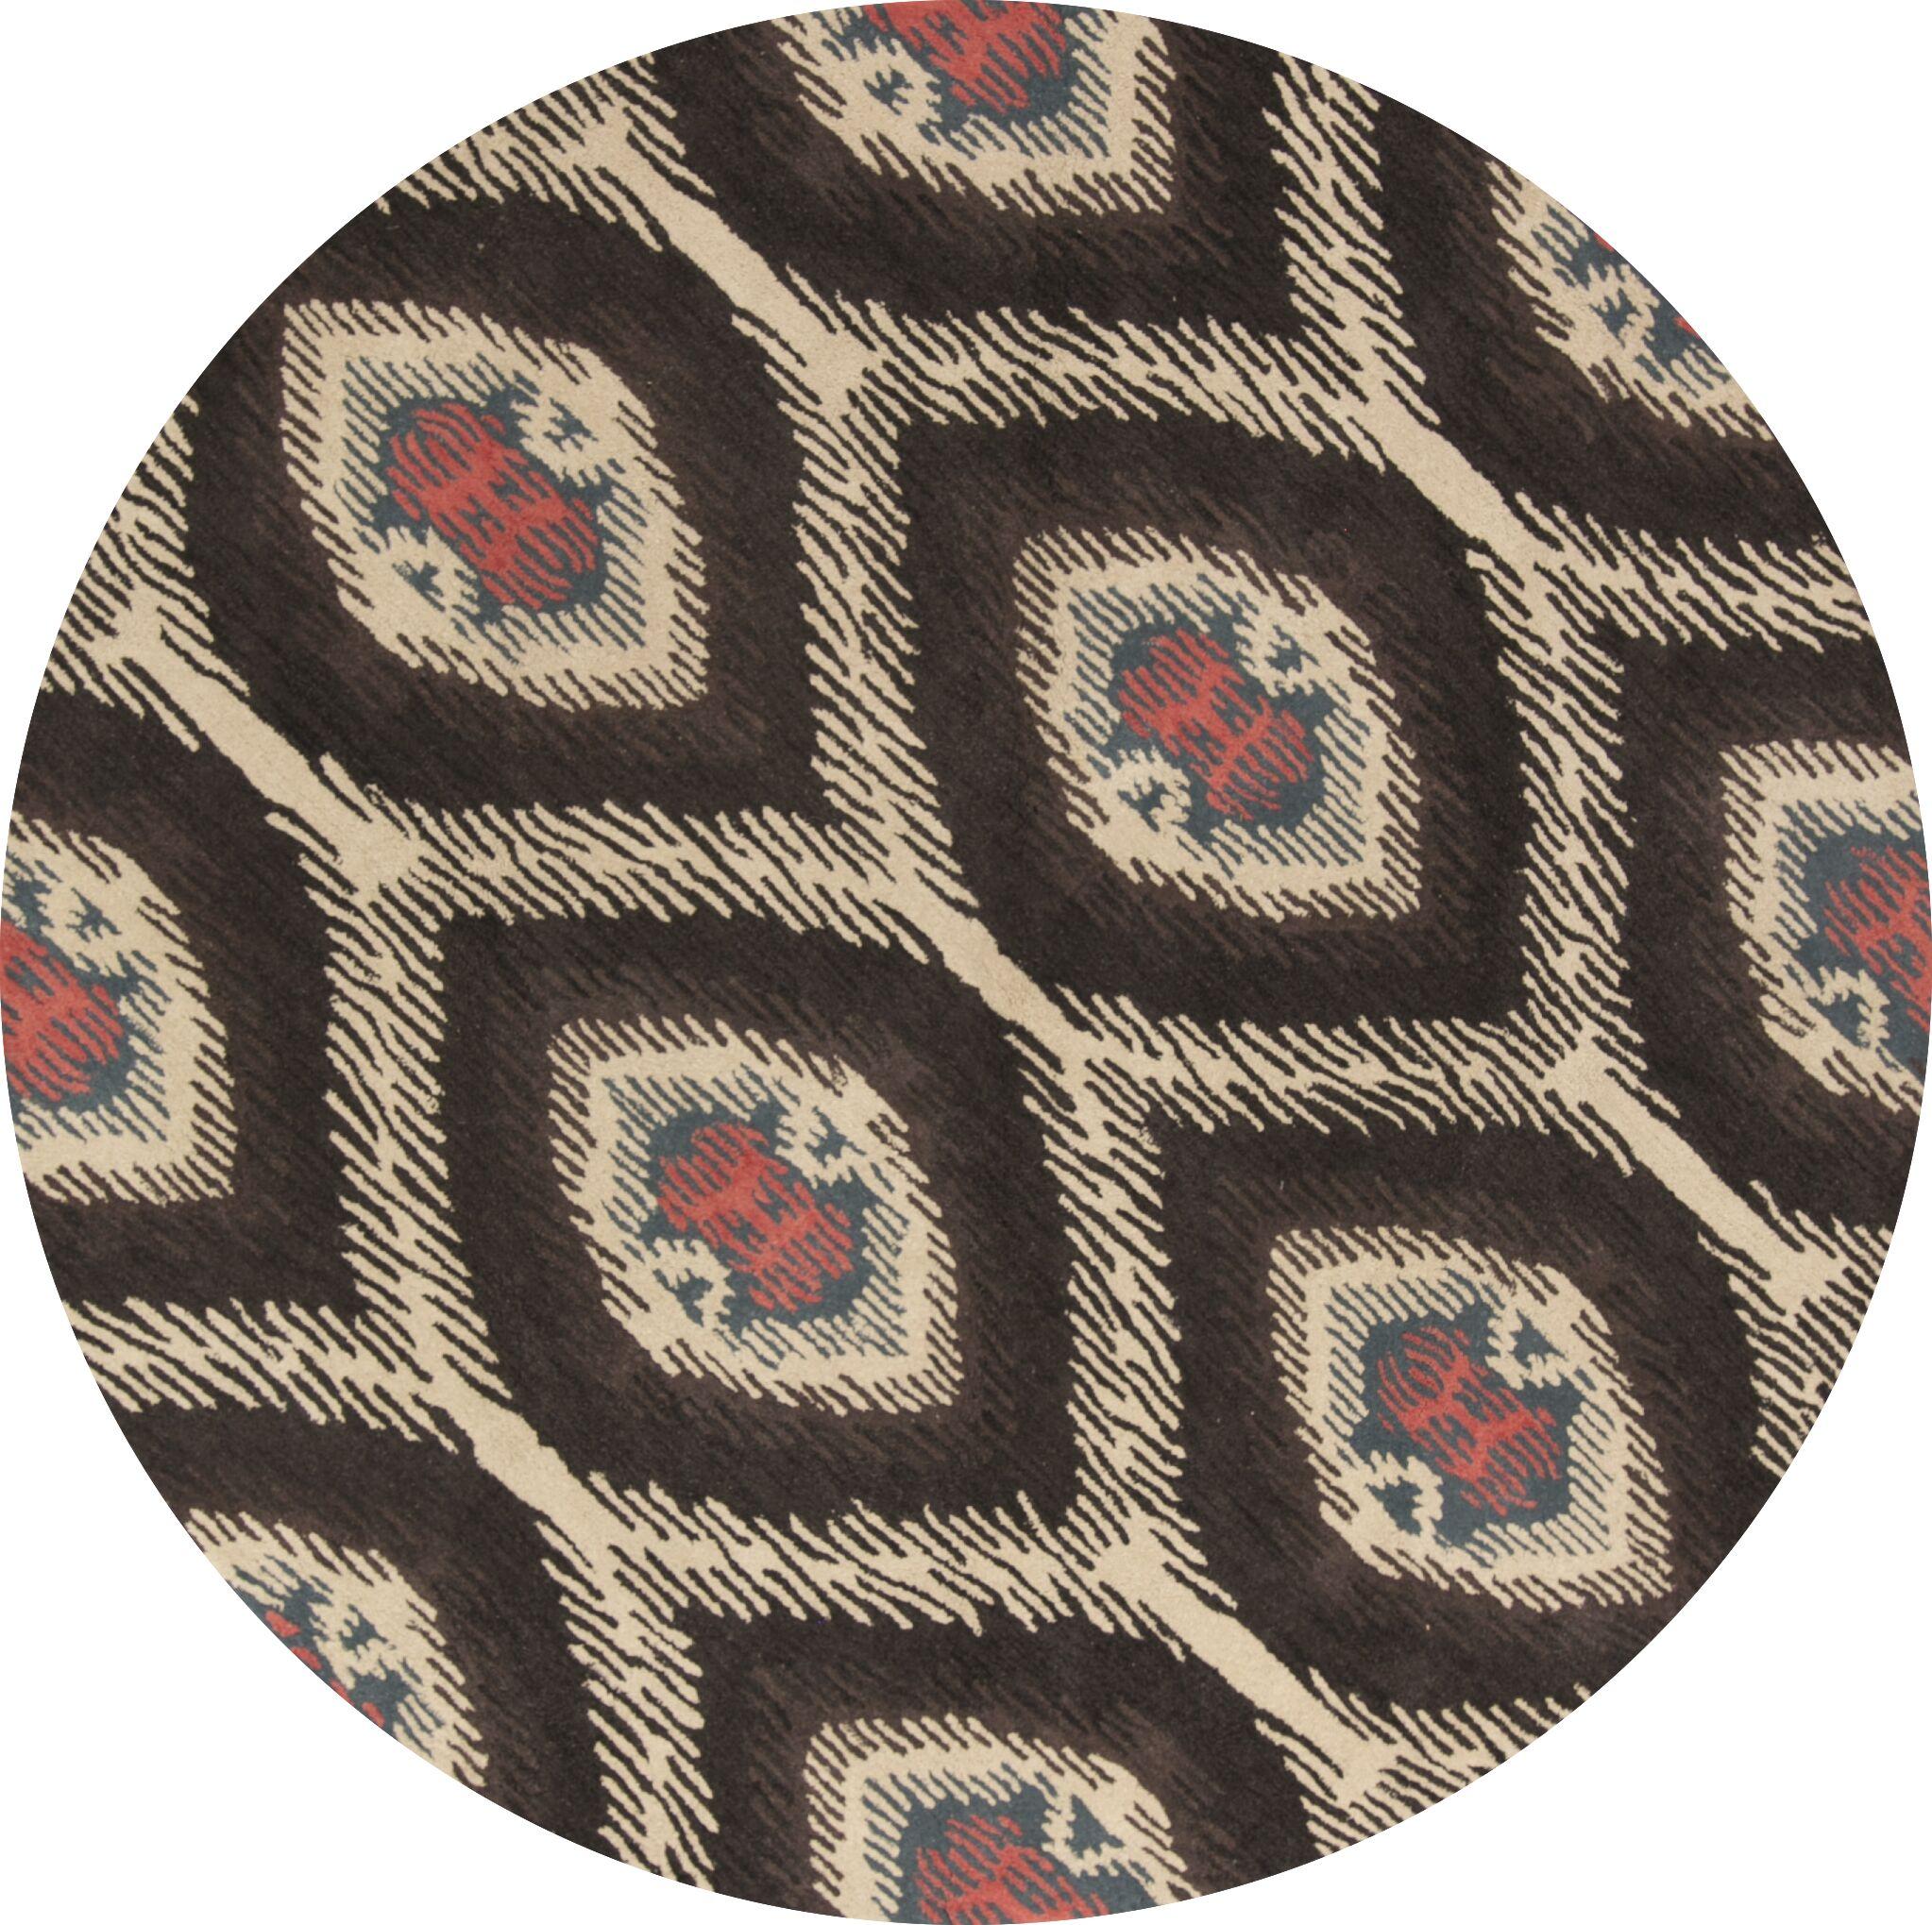 Bovill Agra Oriental Hand-Tufted Wool Black/Beige Area Rug